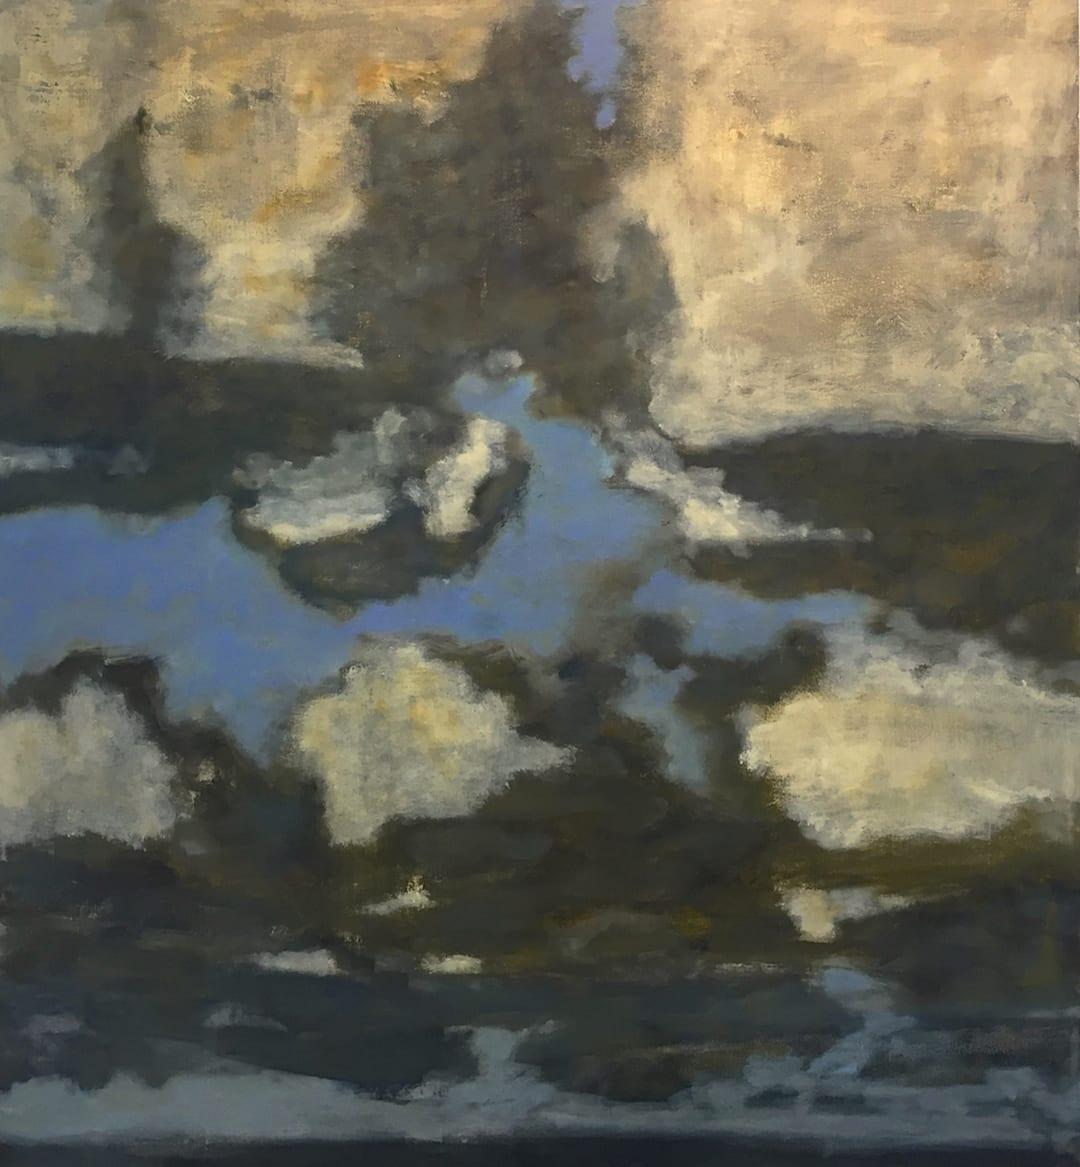 About Landscape: David Konigsberg, KK Kozik, Sally Maca, Amy Talluto